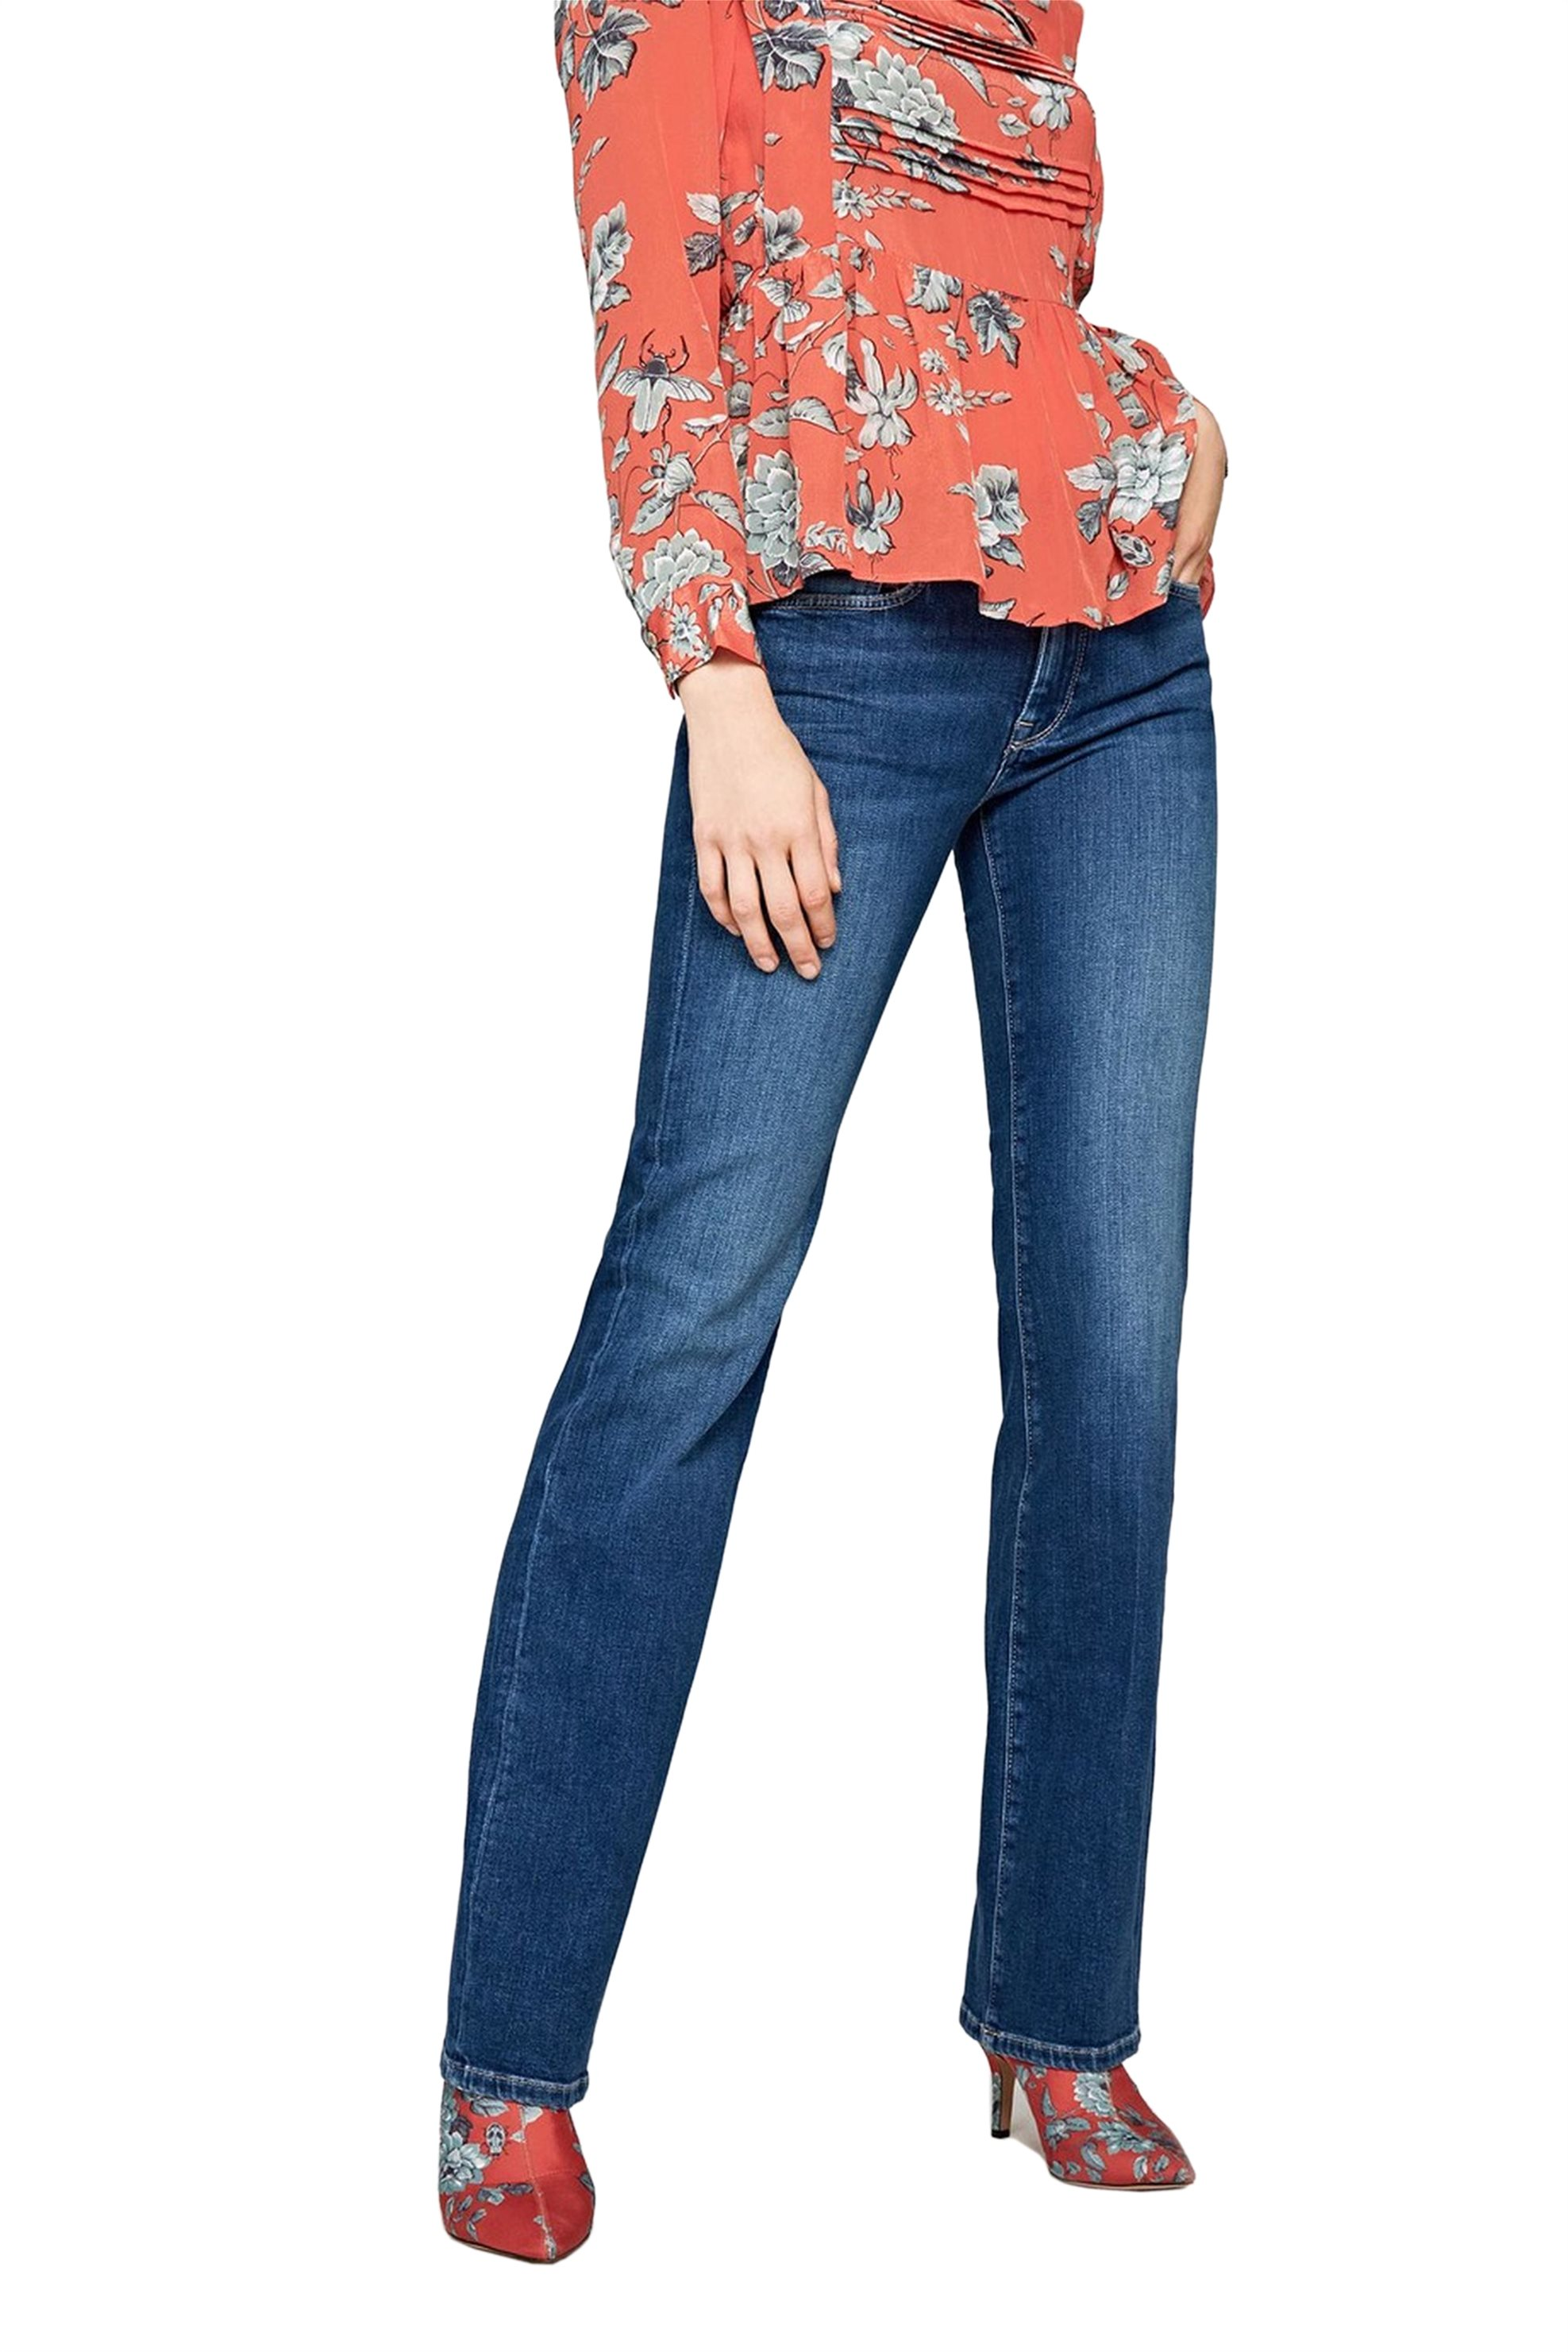 Pepe Jeans γυναικείο τζην παντελόνι flare Αubrey L32 - PL202229GN32 - Μπλε γυναικα   ρουχα   jeans   καμπάνα   bootcut